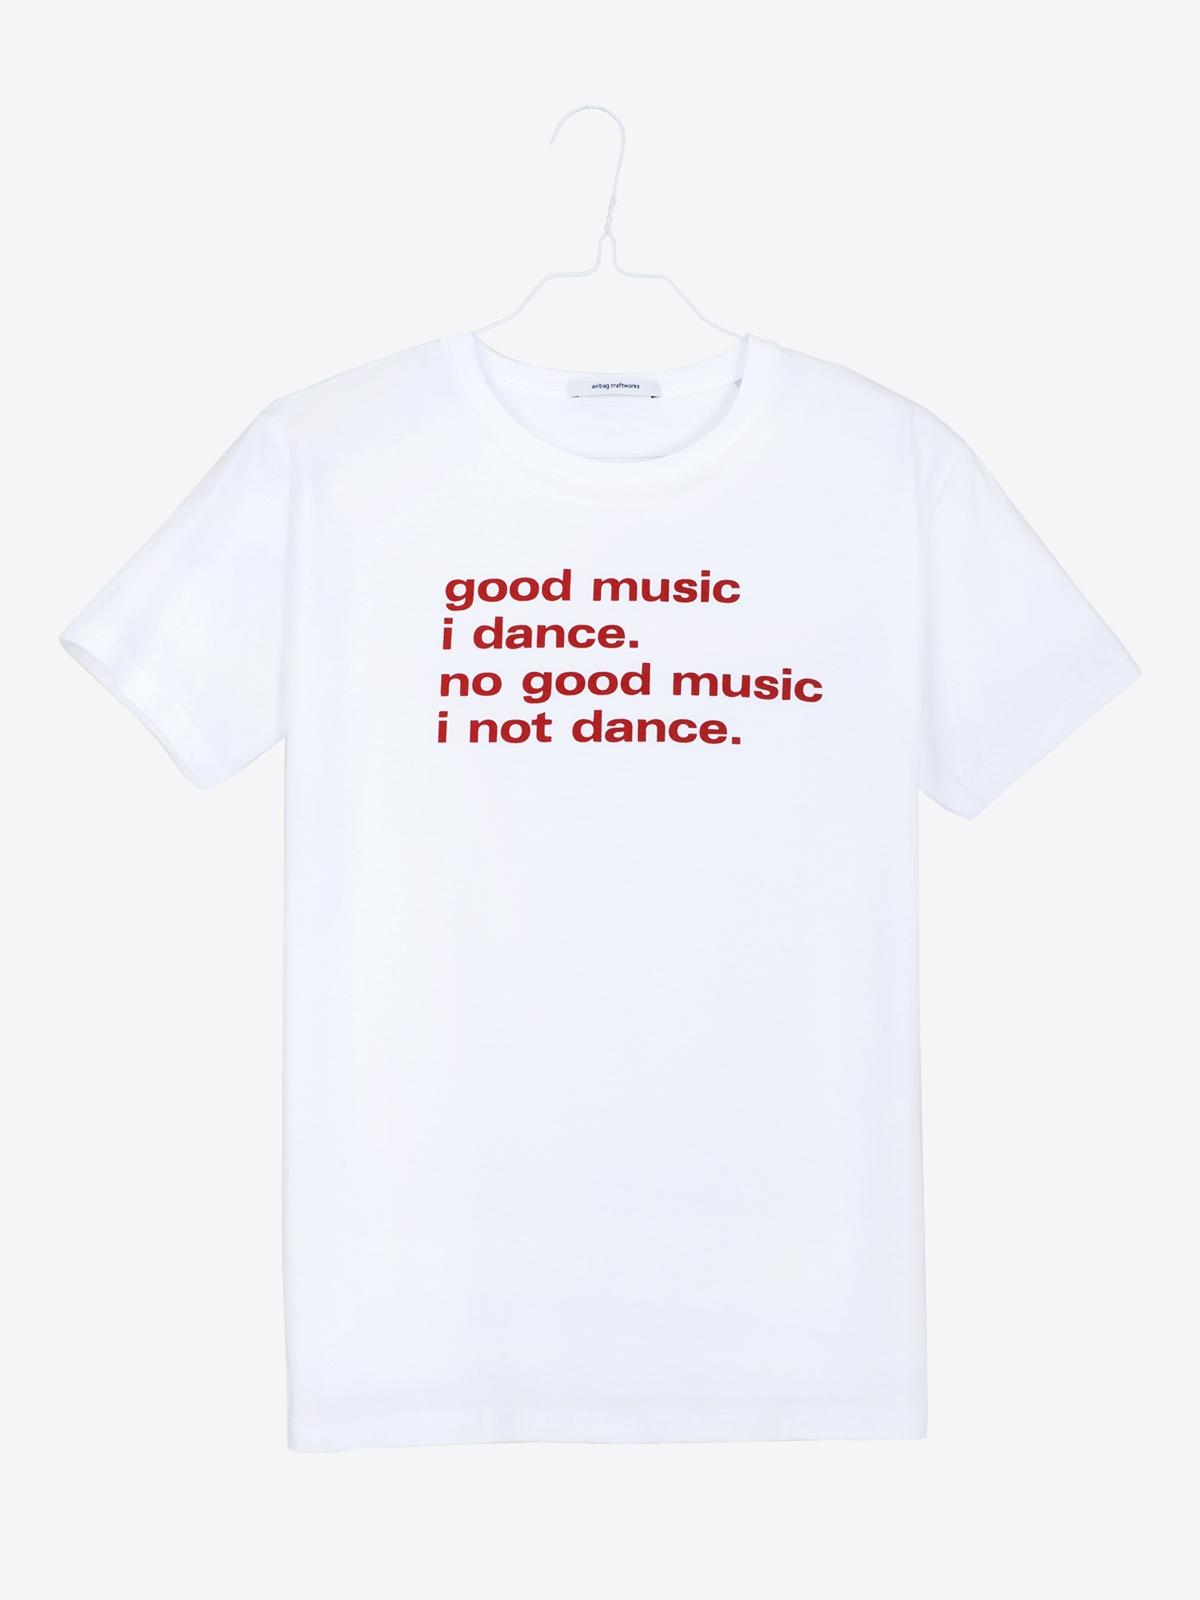 airbag craftworks good music i dance